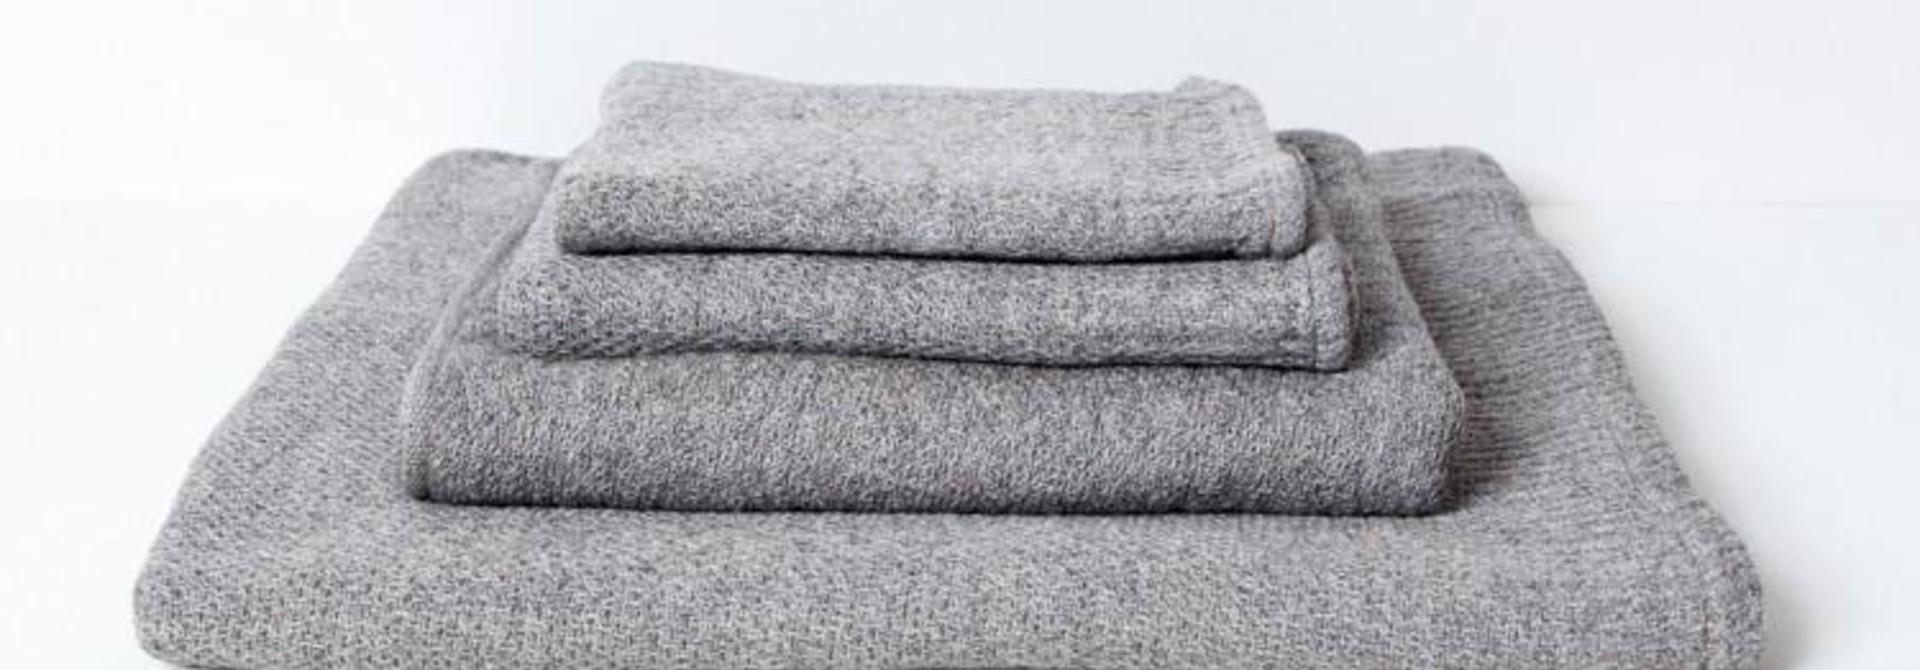 Hand Towel - Lana - Grey